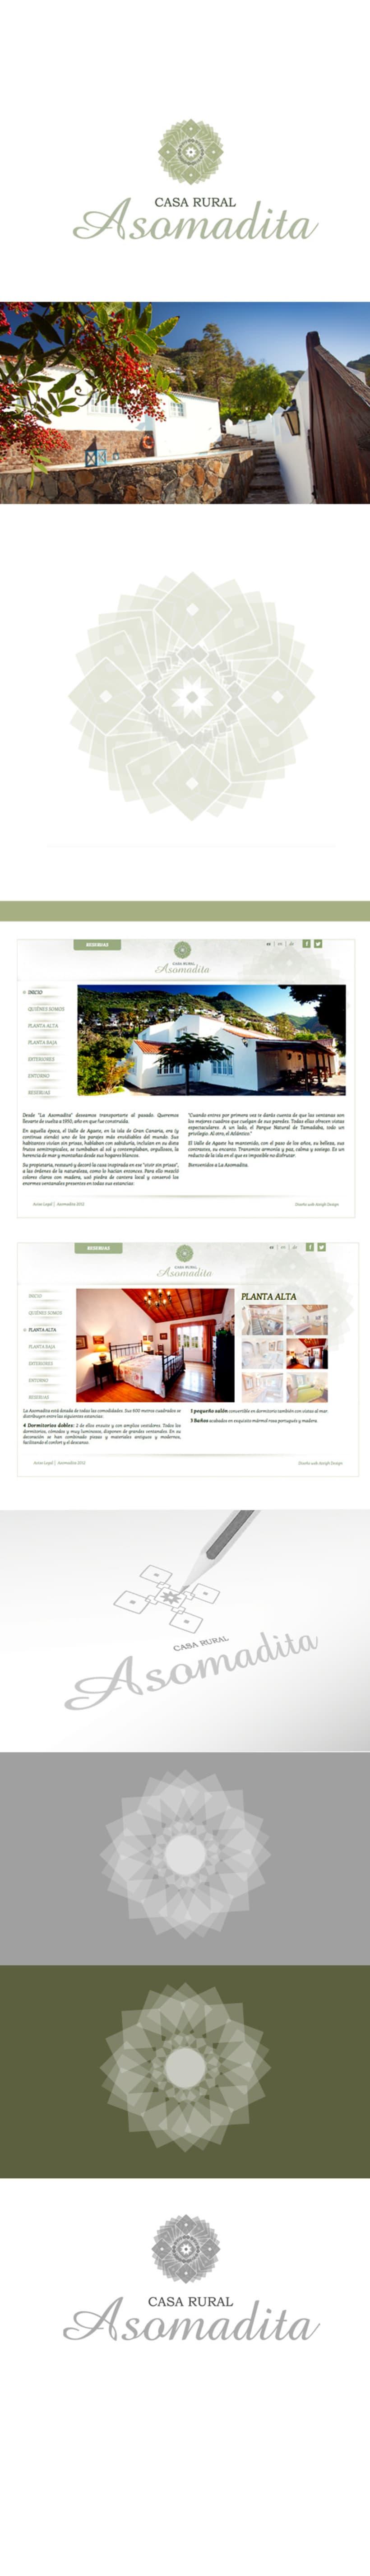 Asomadita Casa Rural 2